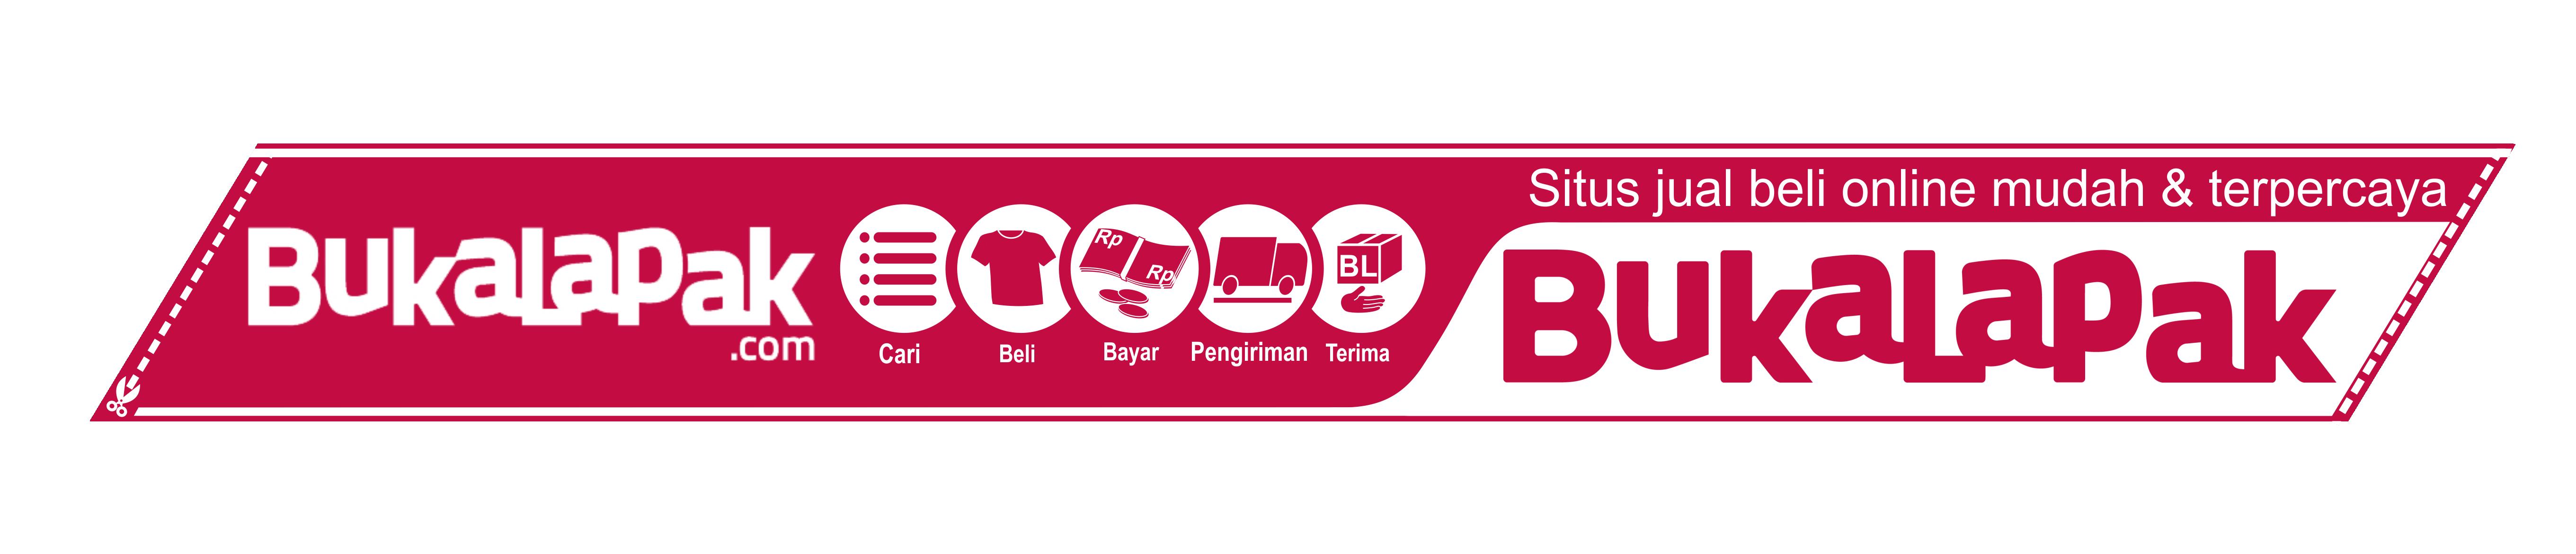 Sejarah Bukalapak Sang Marketplace Online Indonesia